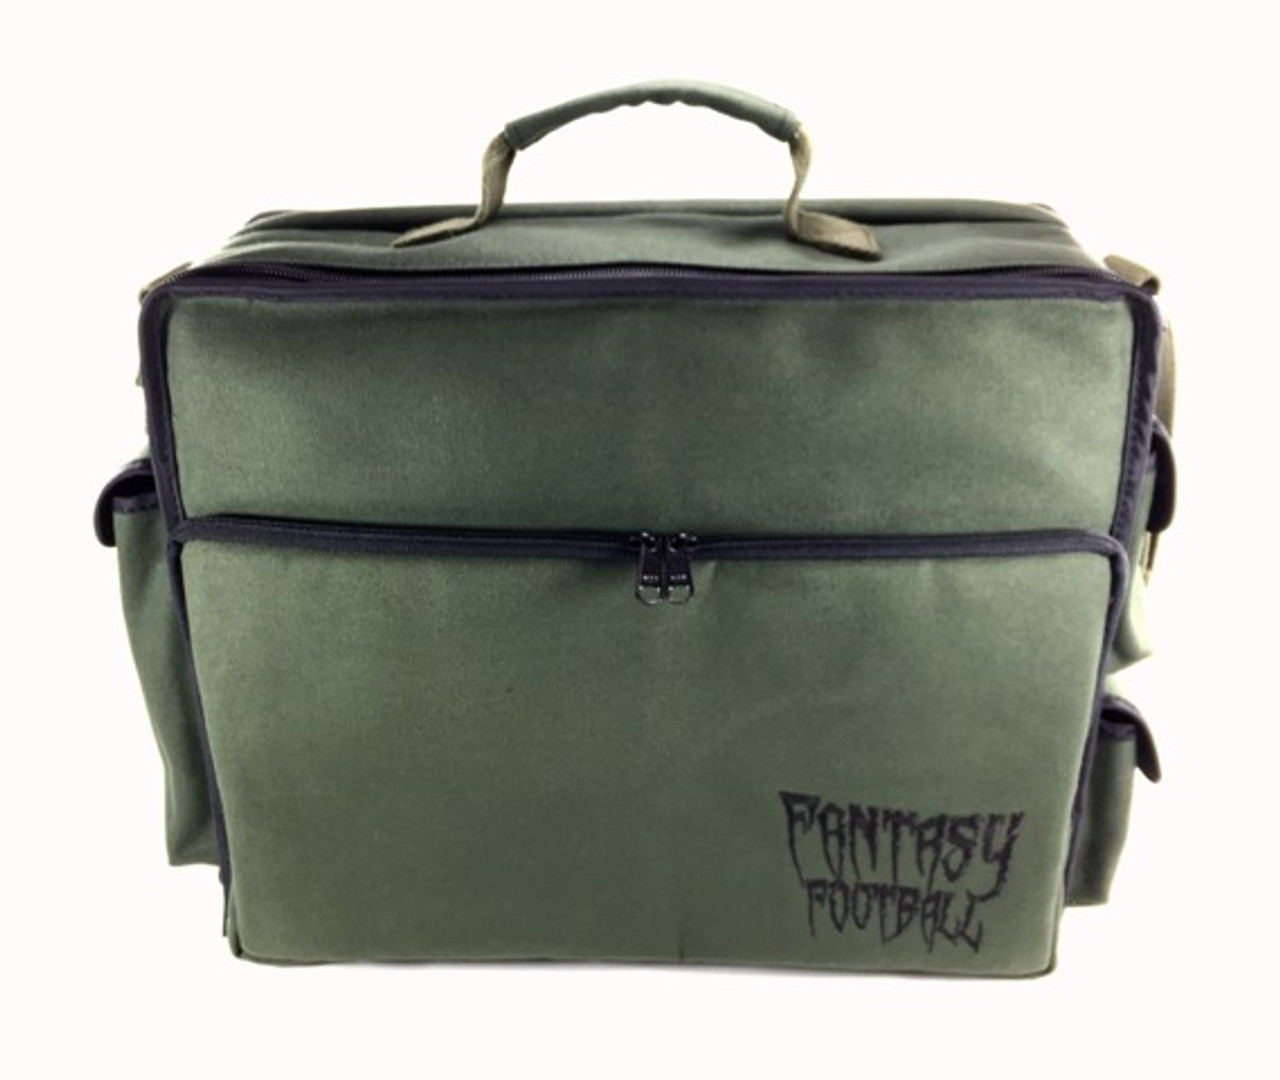 Fantasy Football Bag Standard Load Out Battle Foam Последние твиты от battle foam (@battlefoam). fantasy football bag standard load out